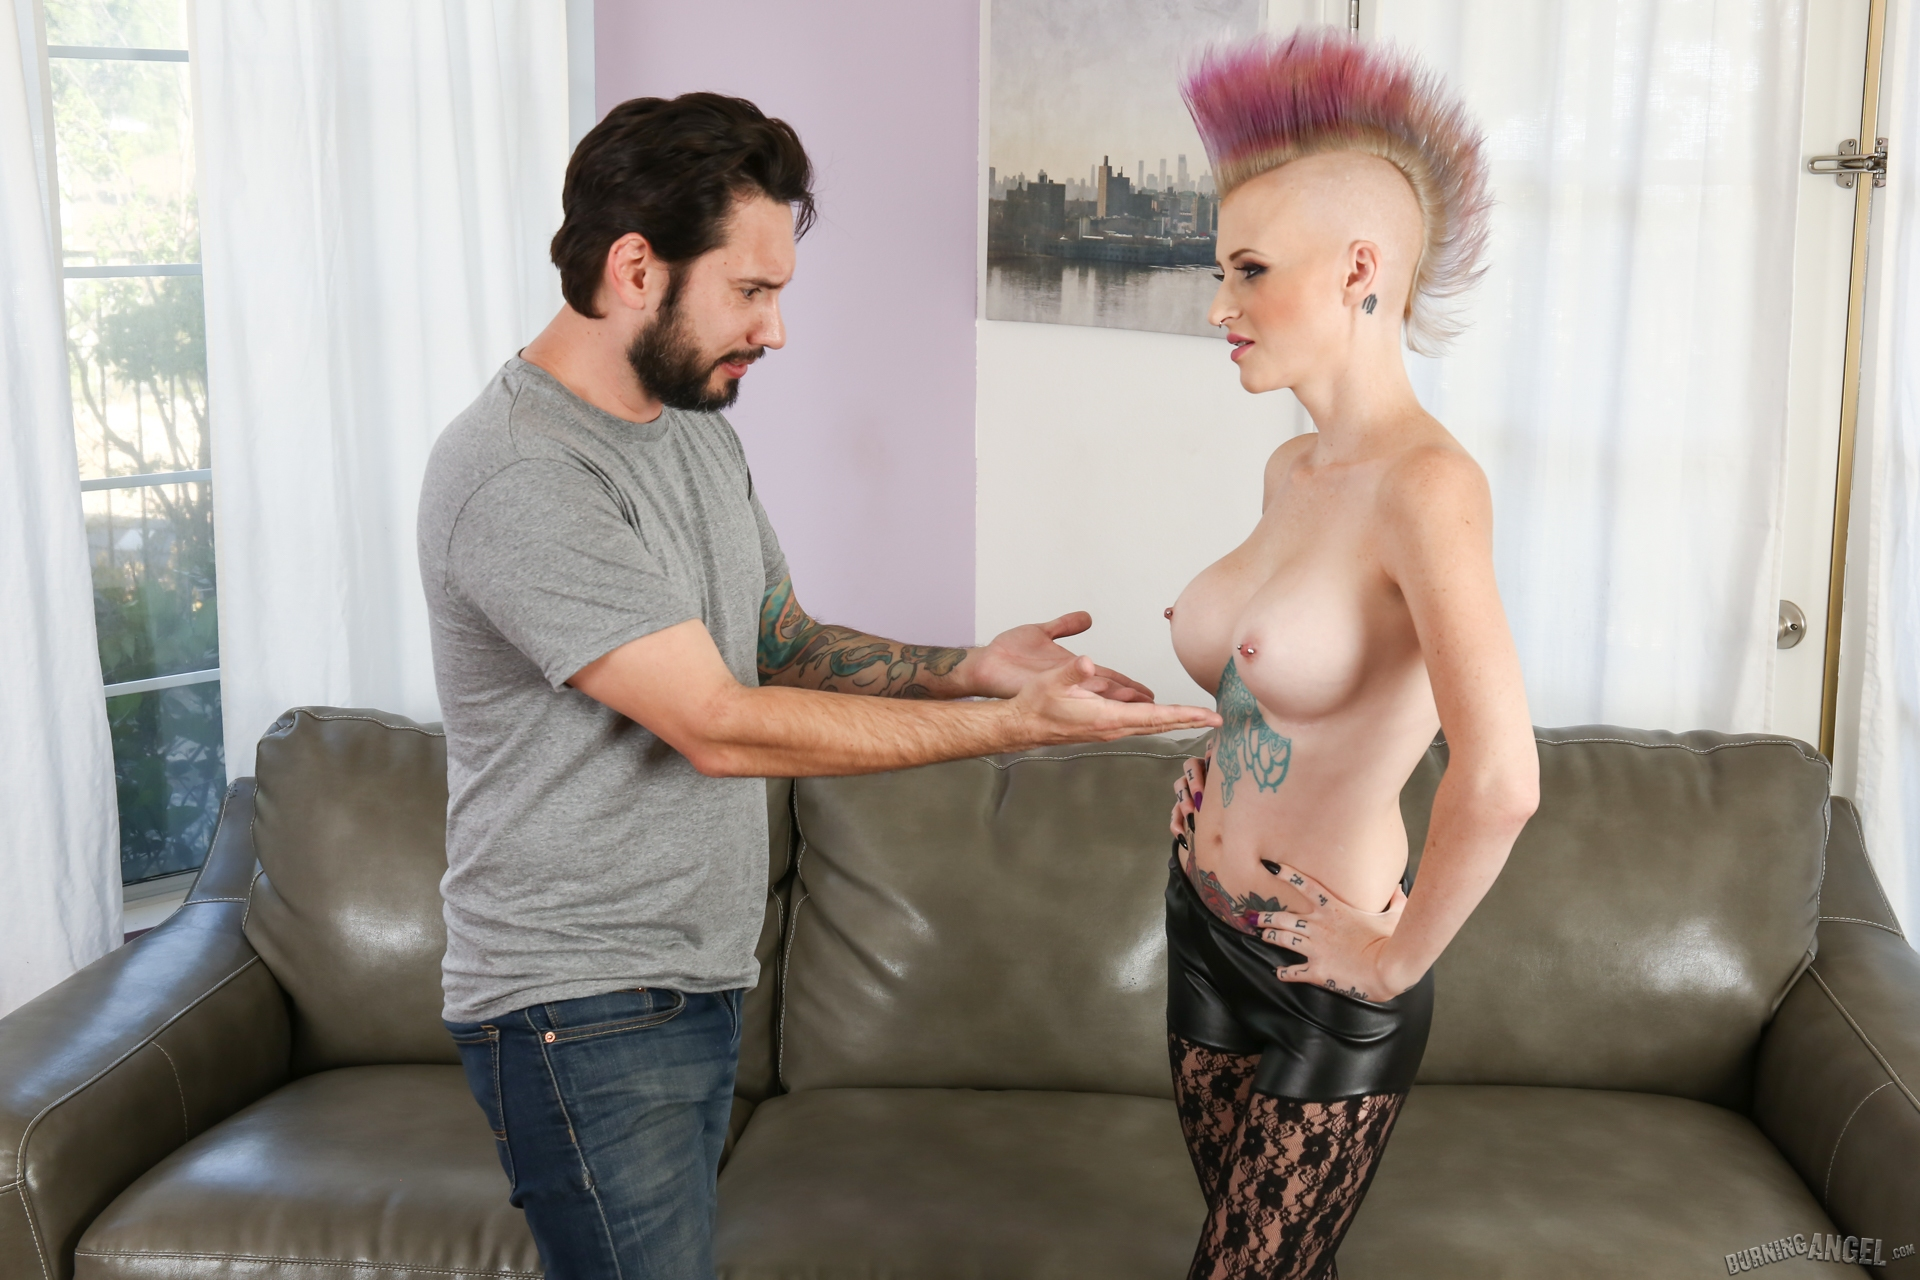 ameteur gymnast anal porn